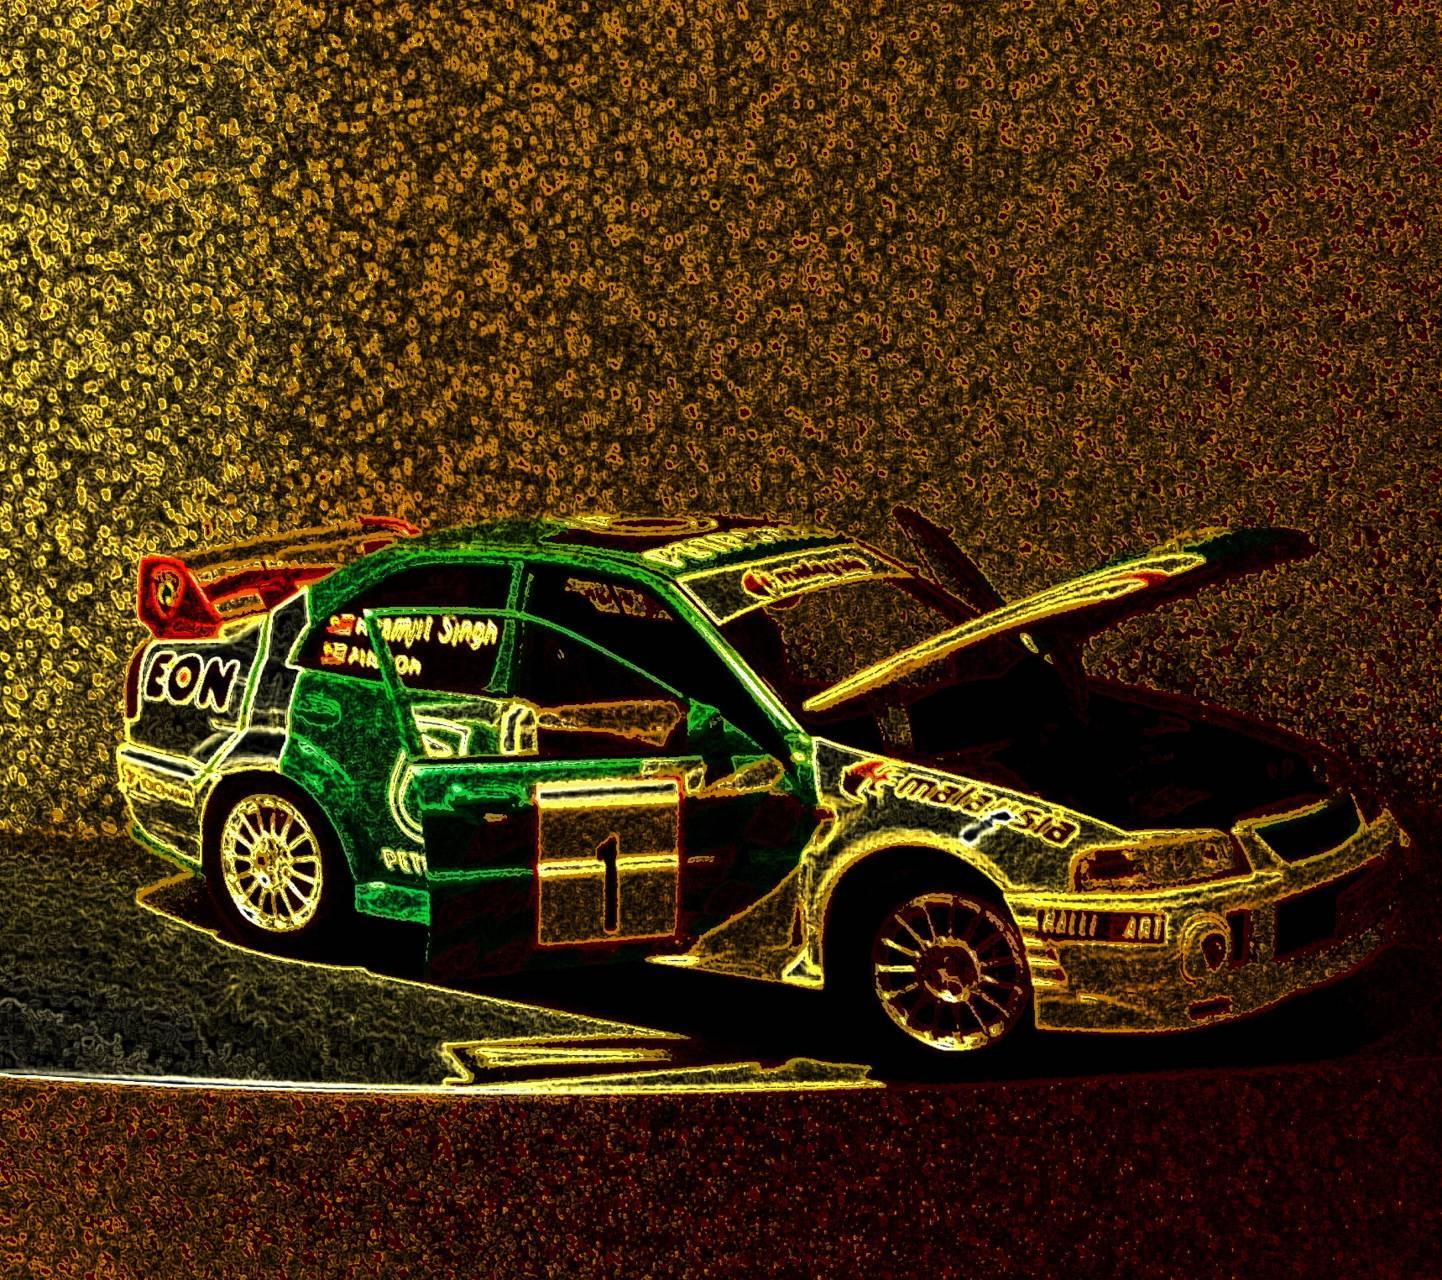 Mitsubishi rally